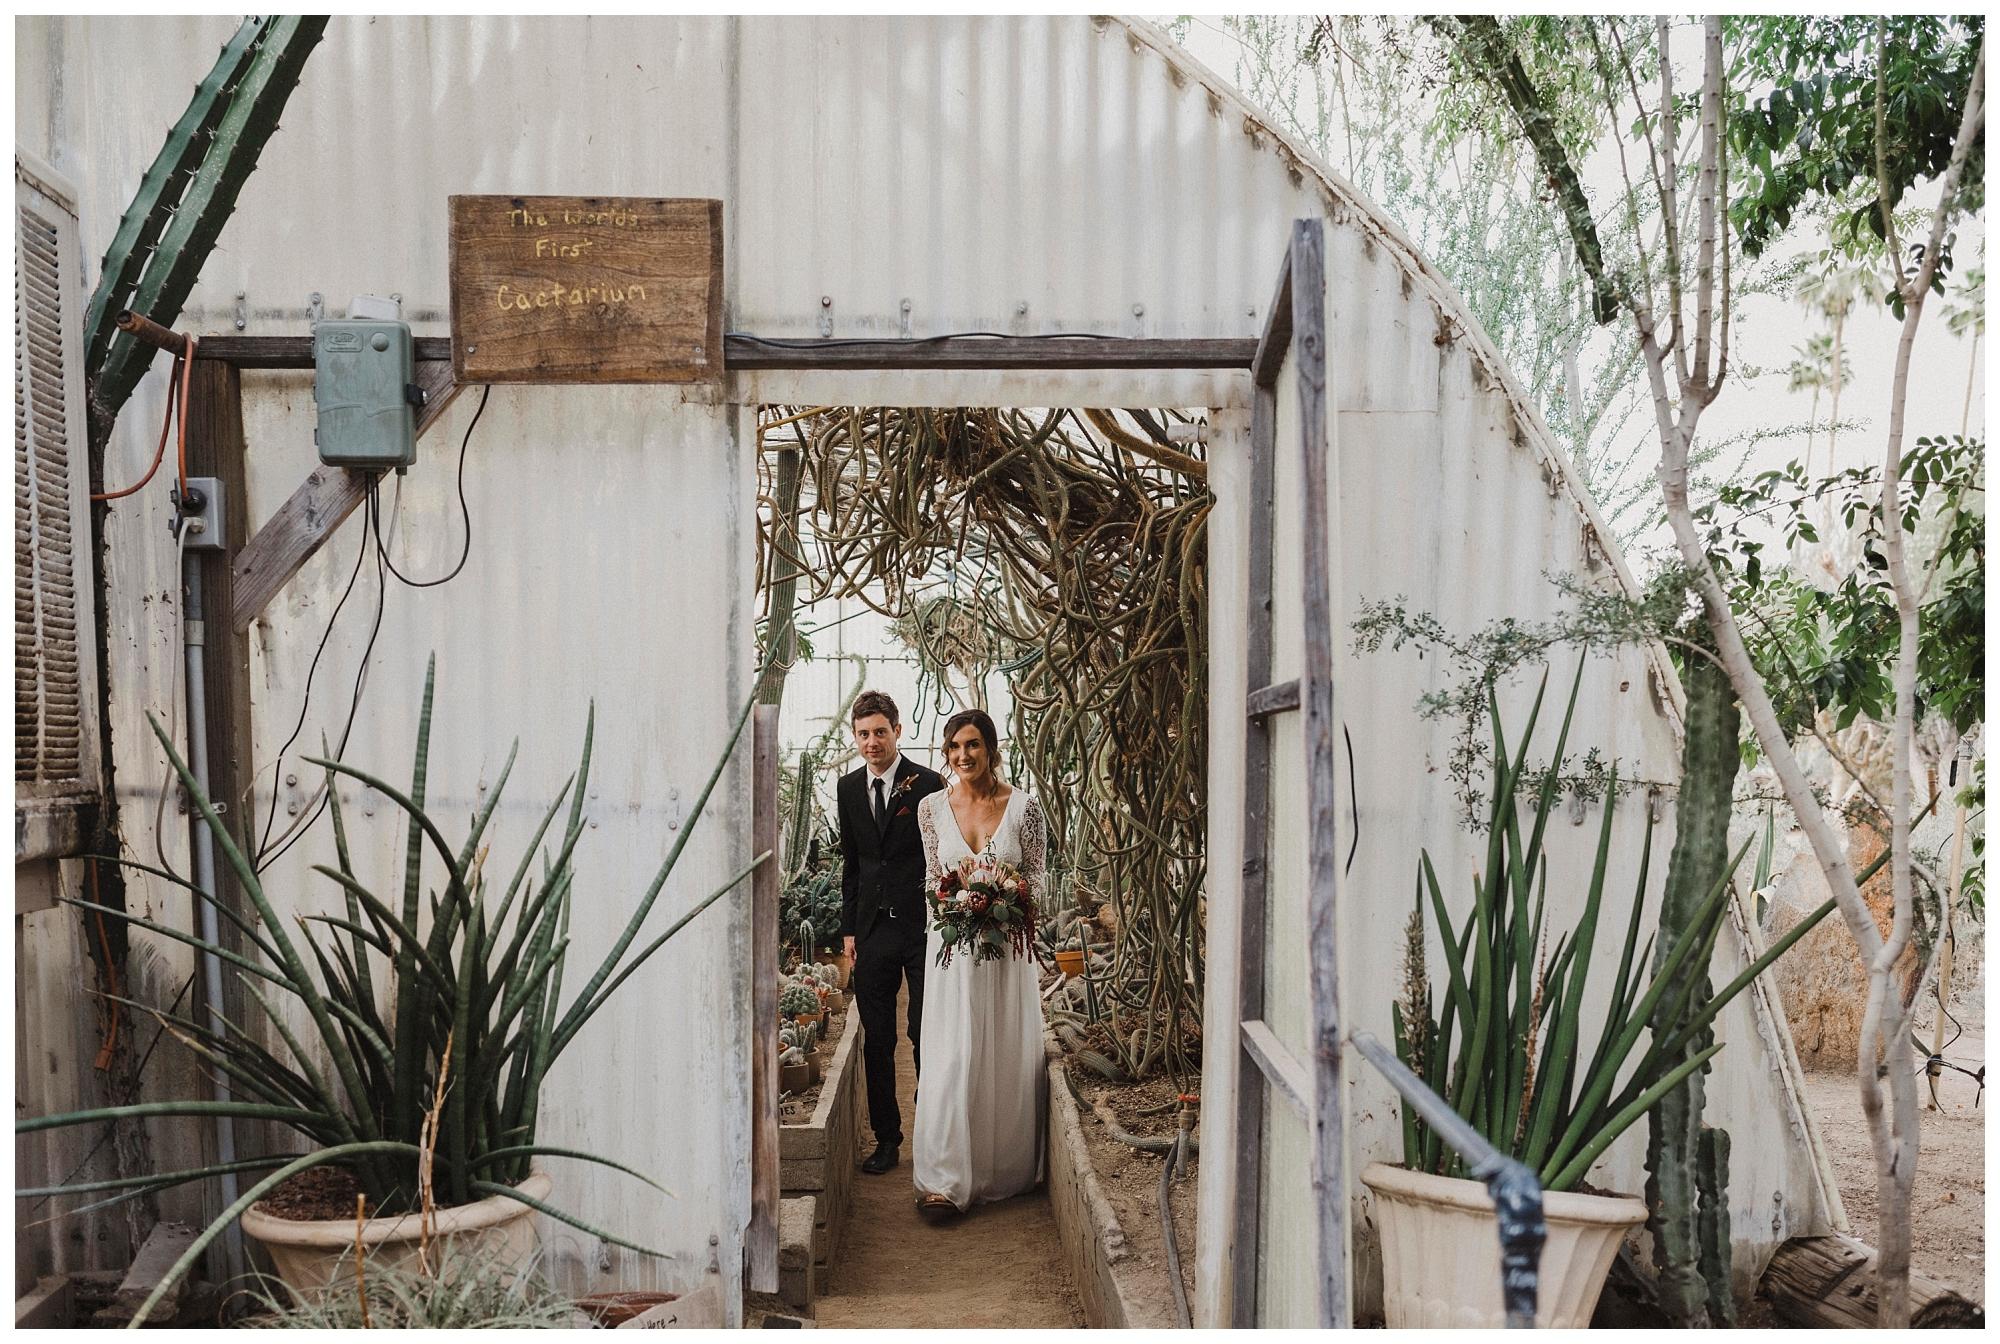 Ace Hotel Wedding Palm Springs (34).jpg